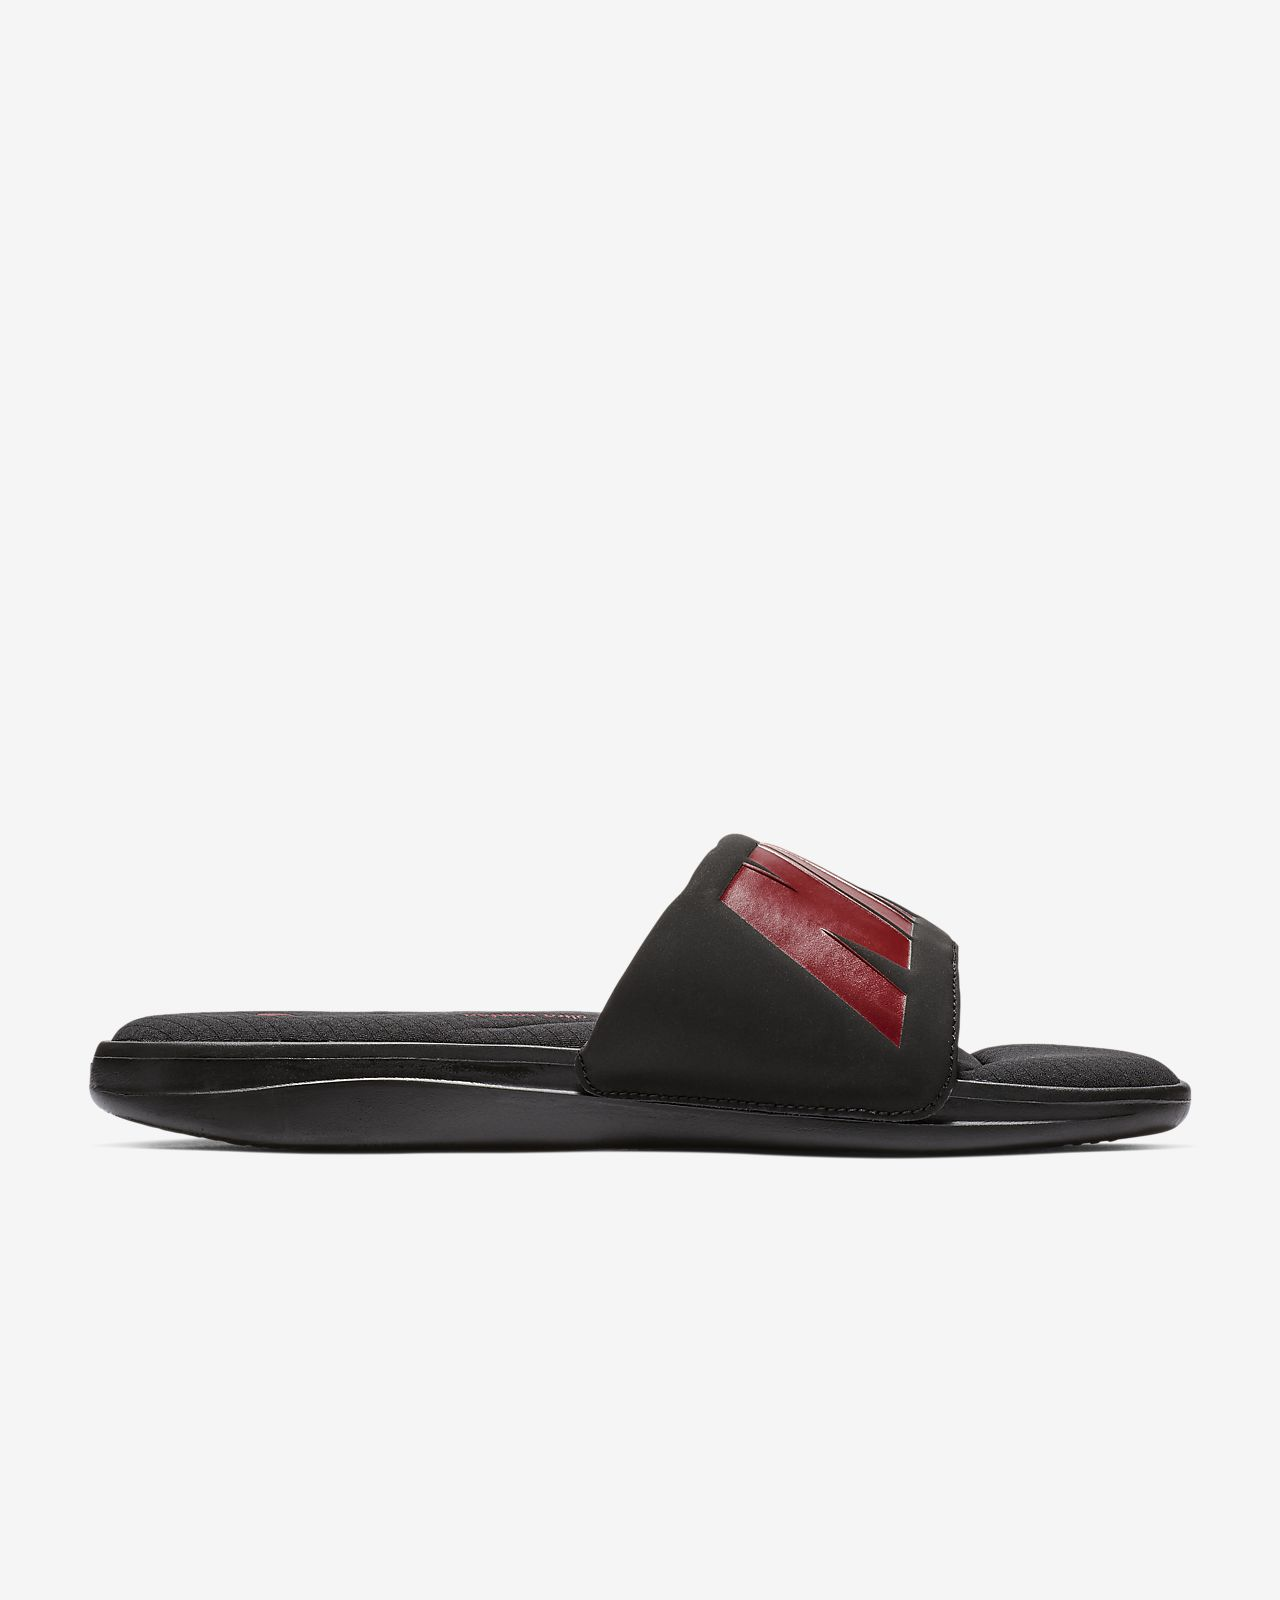 f1103c2e7 Nike Ultra Comfort 3 Men s Slide. Nike.com SG